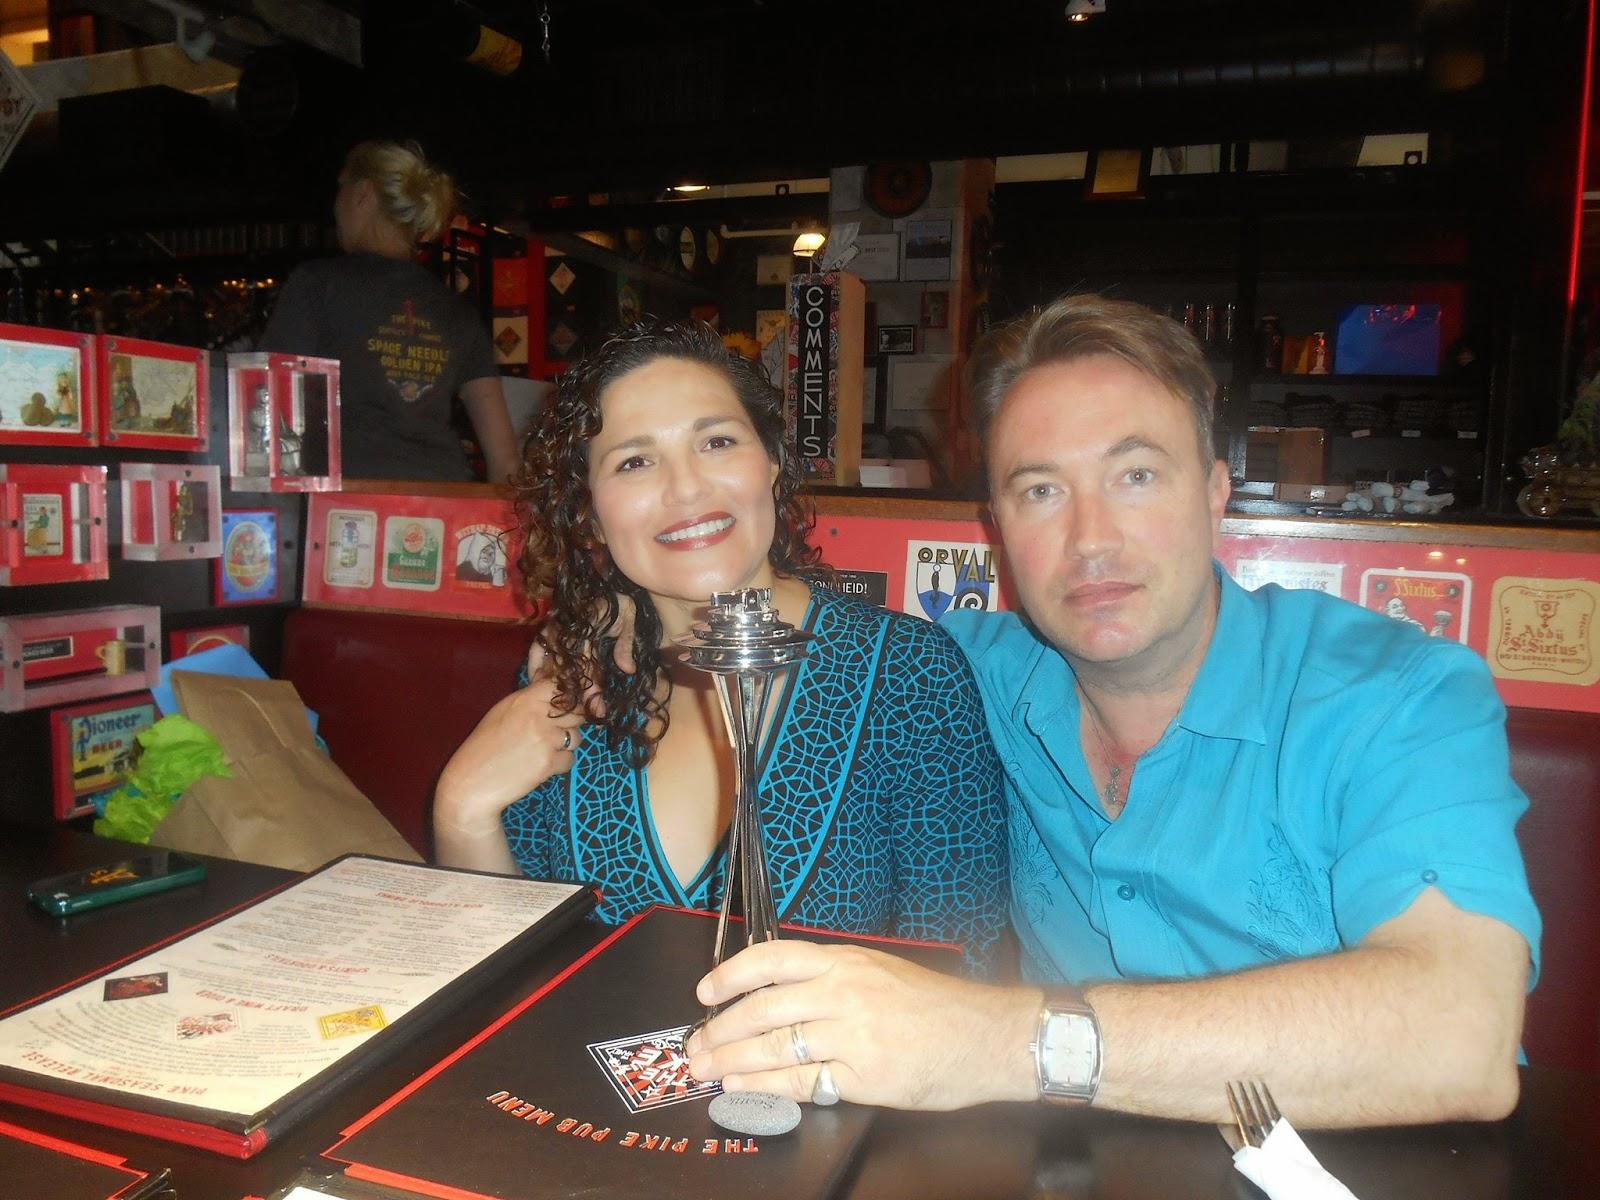 Christophers pub meet swinger